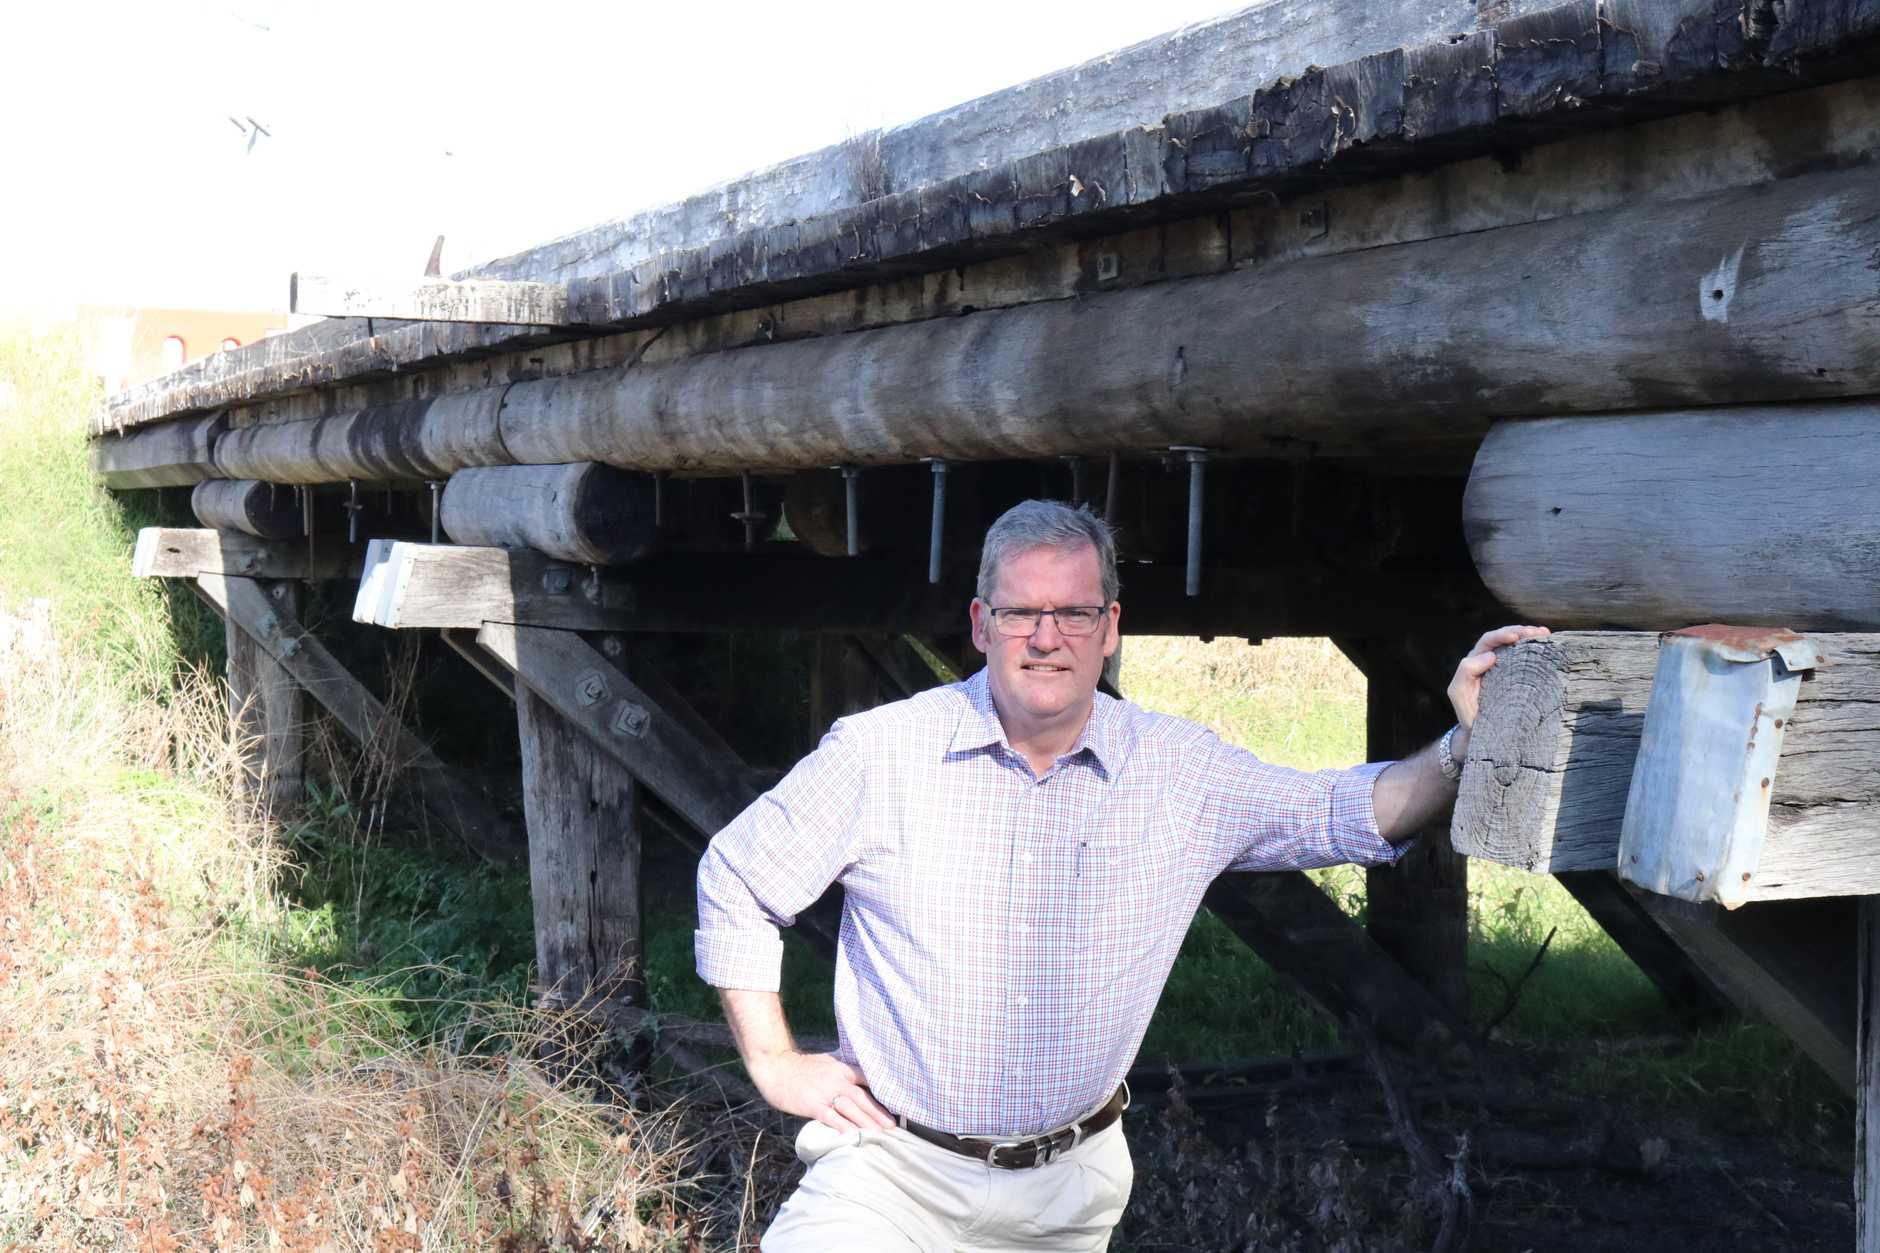 John McVeigh announces bridge funding worth $800,000.